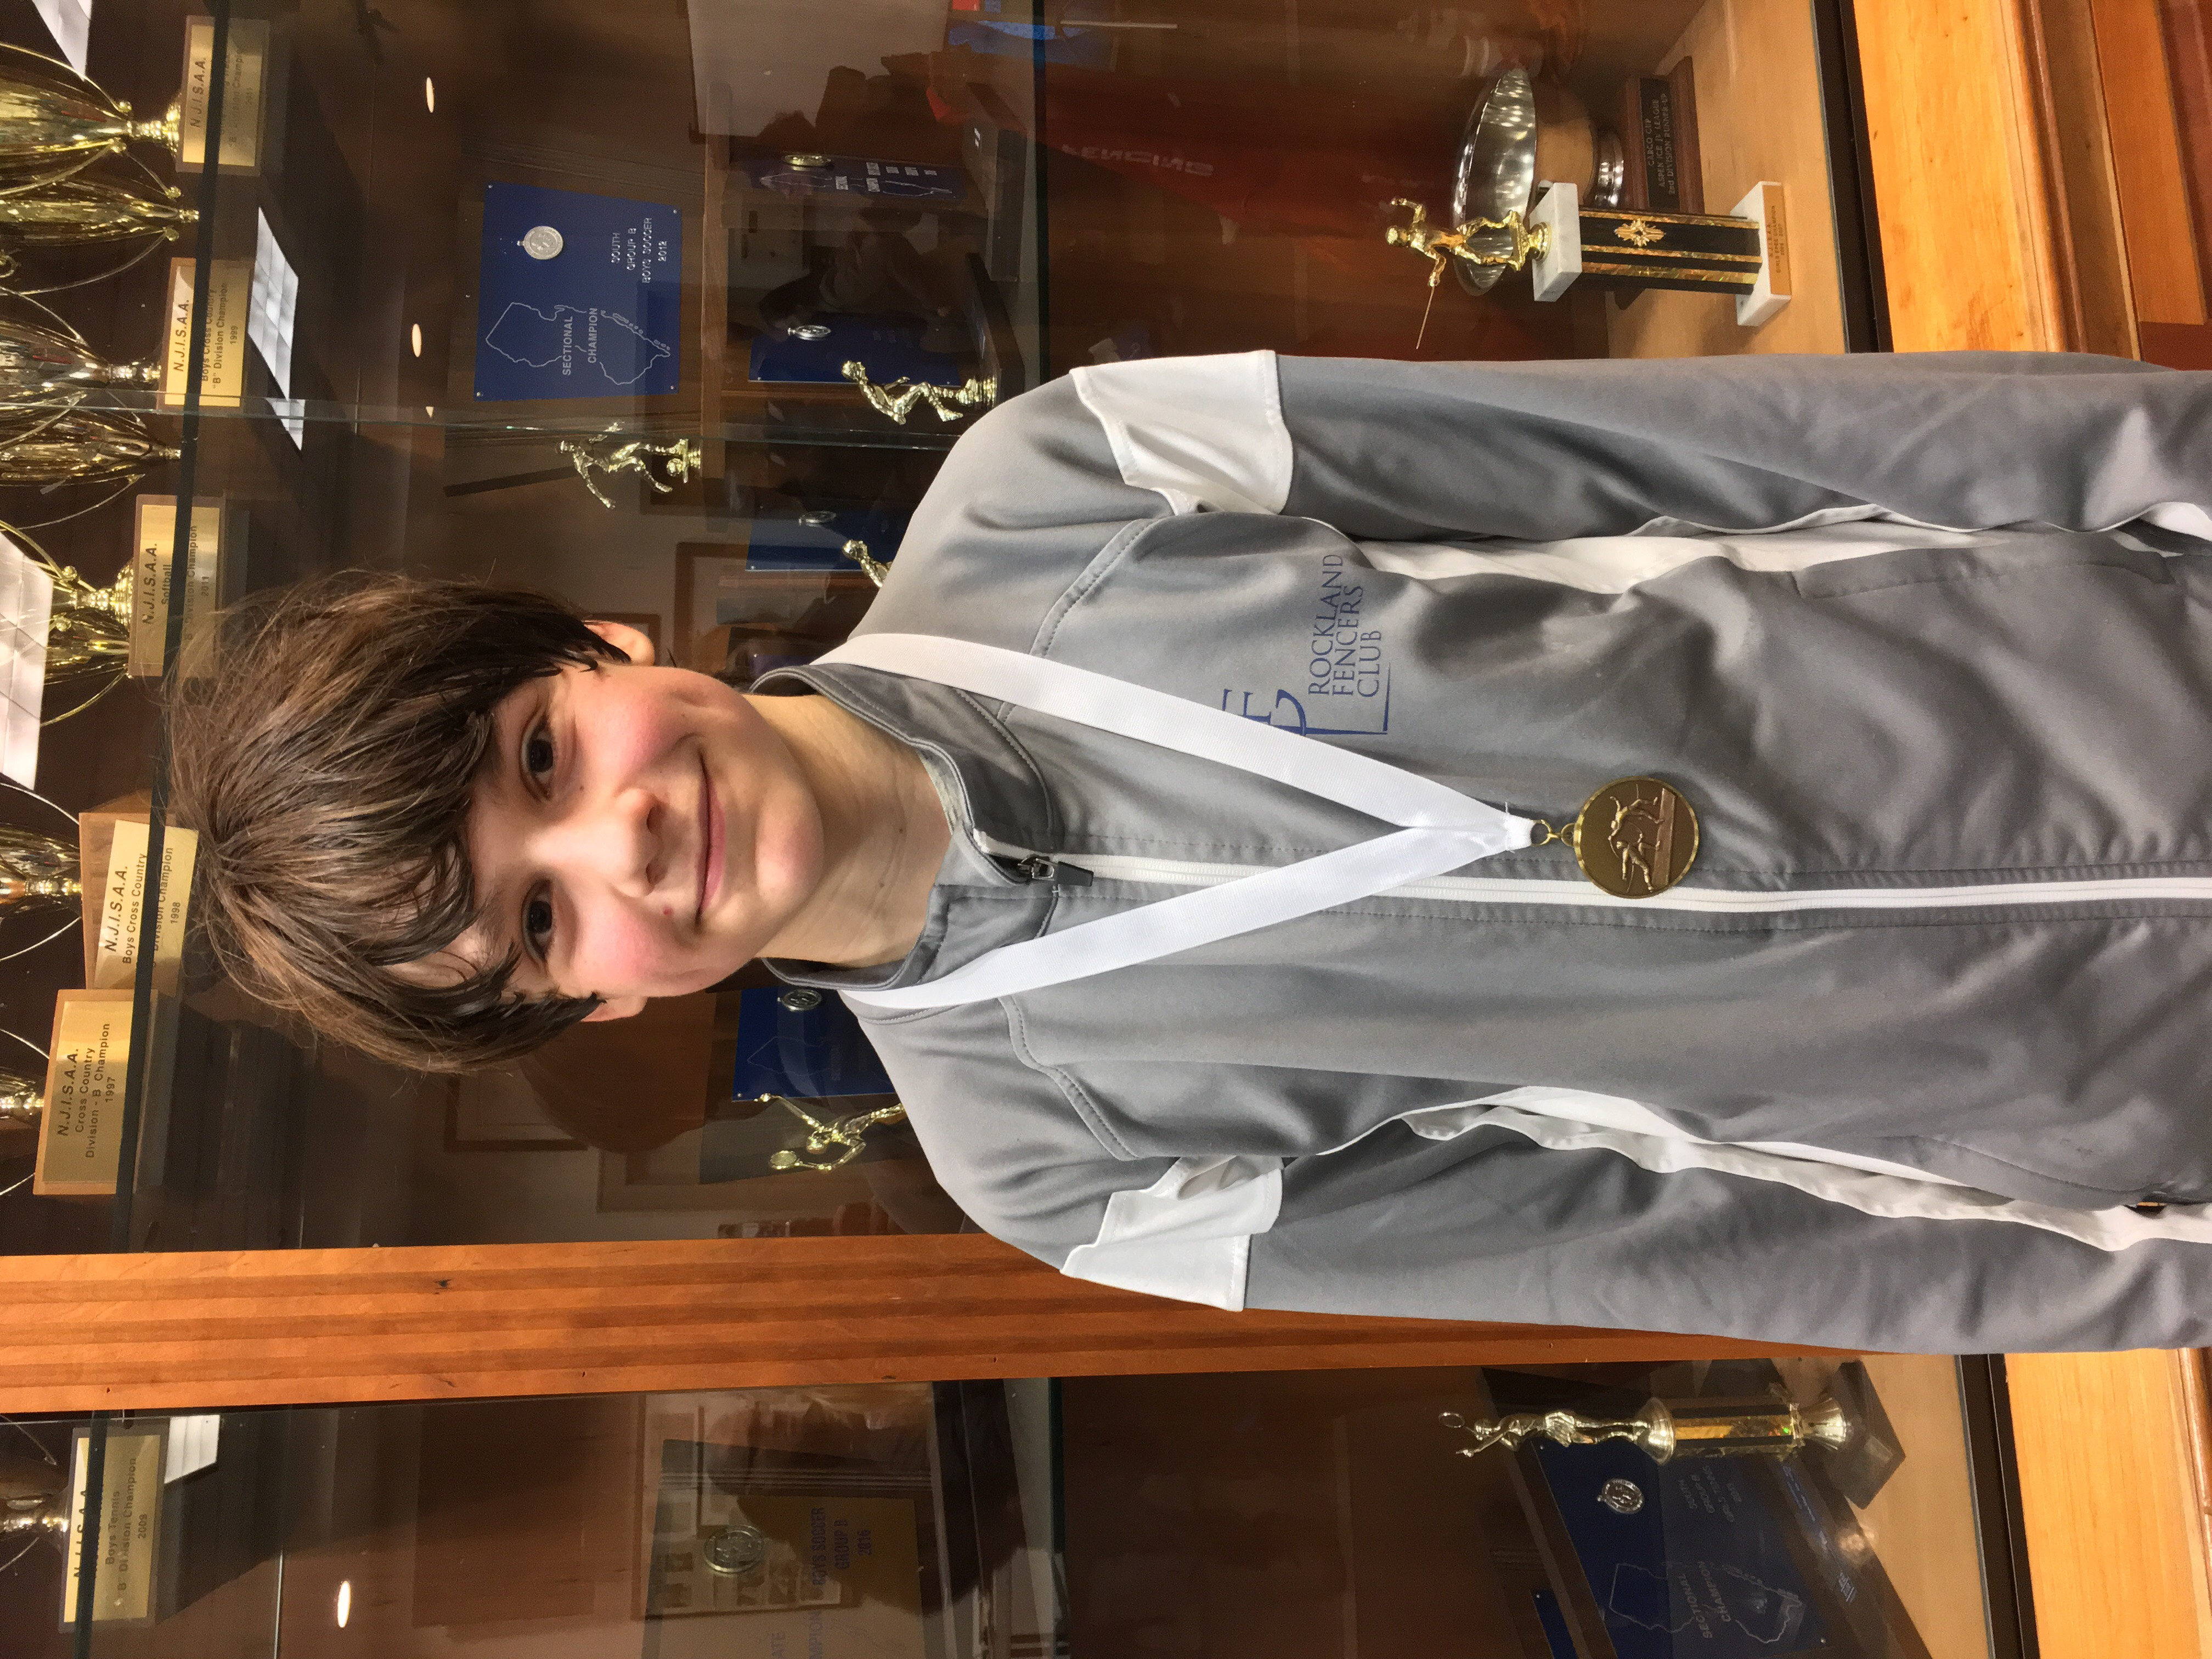 Logan Bobrow RFC Fencer